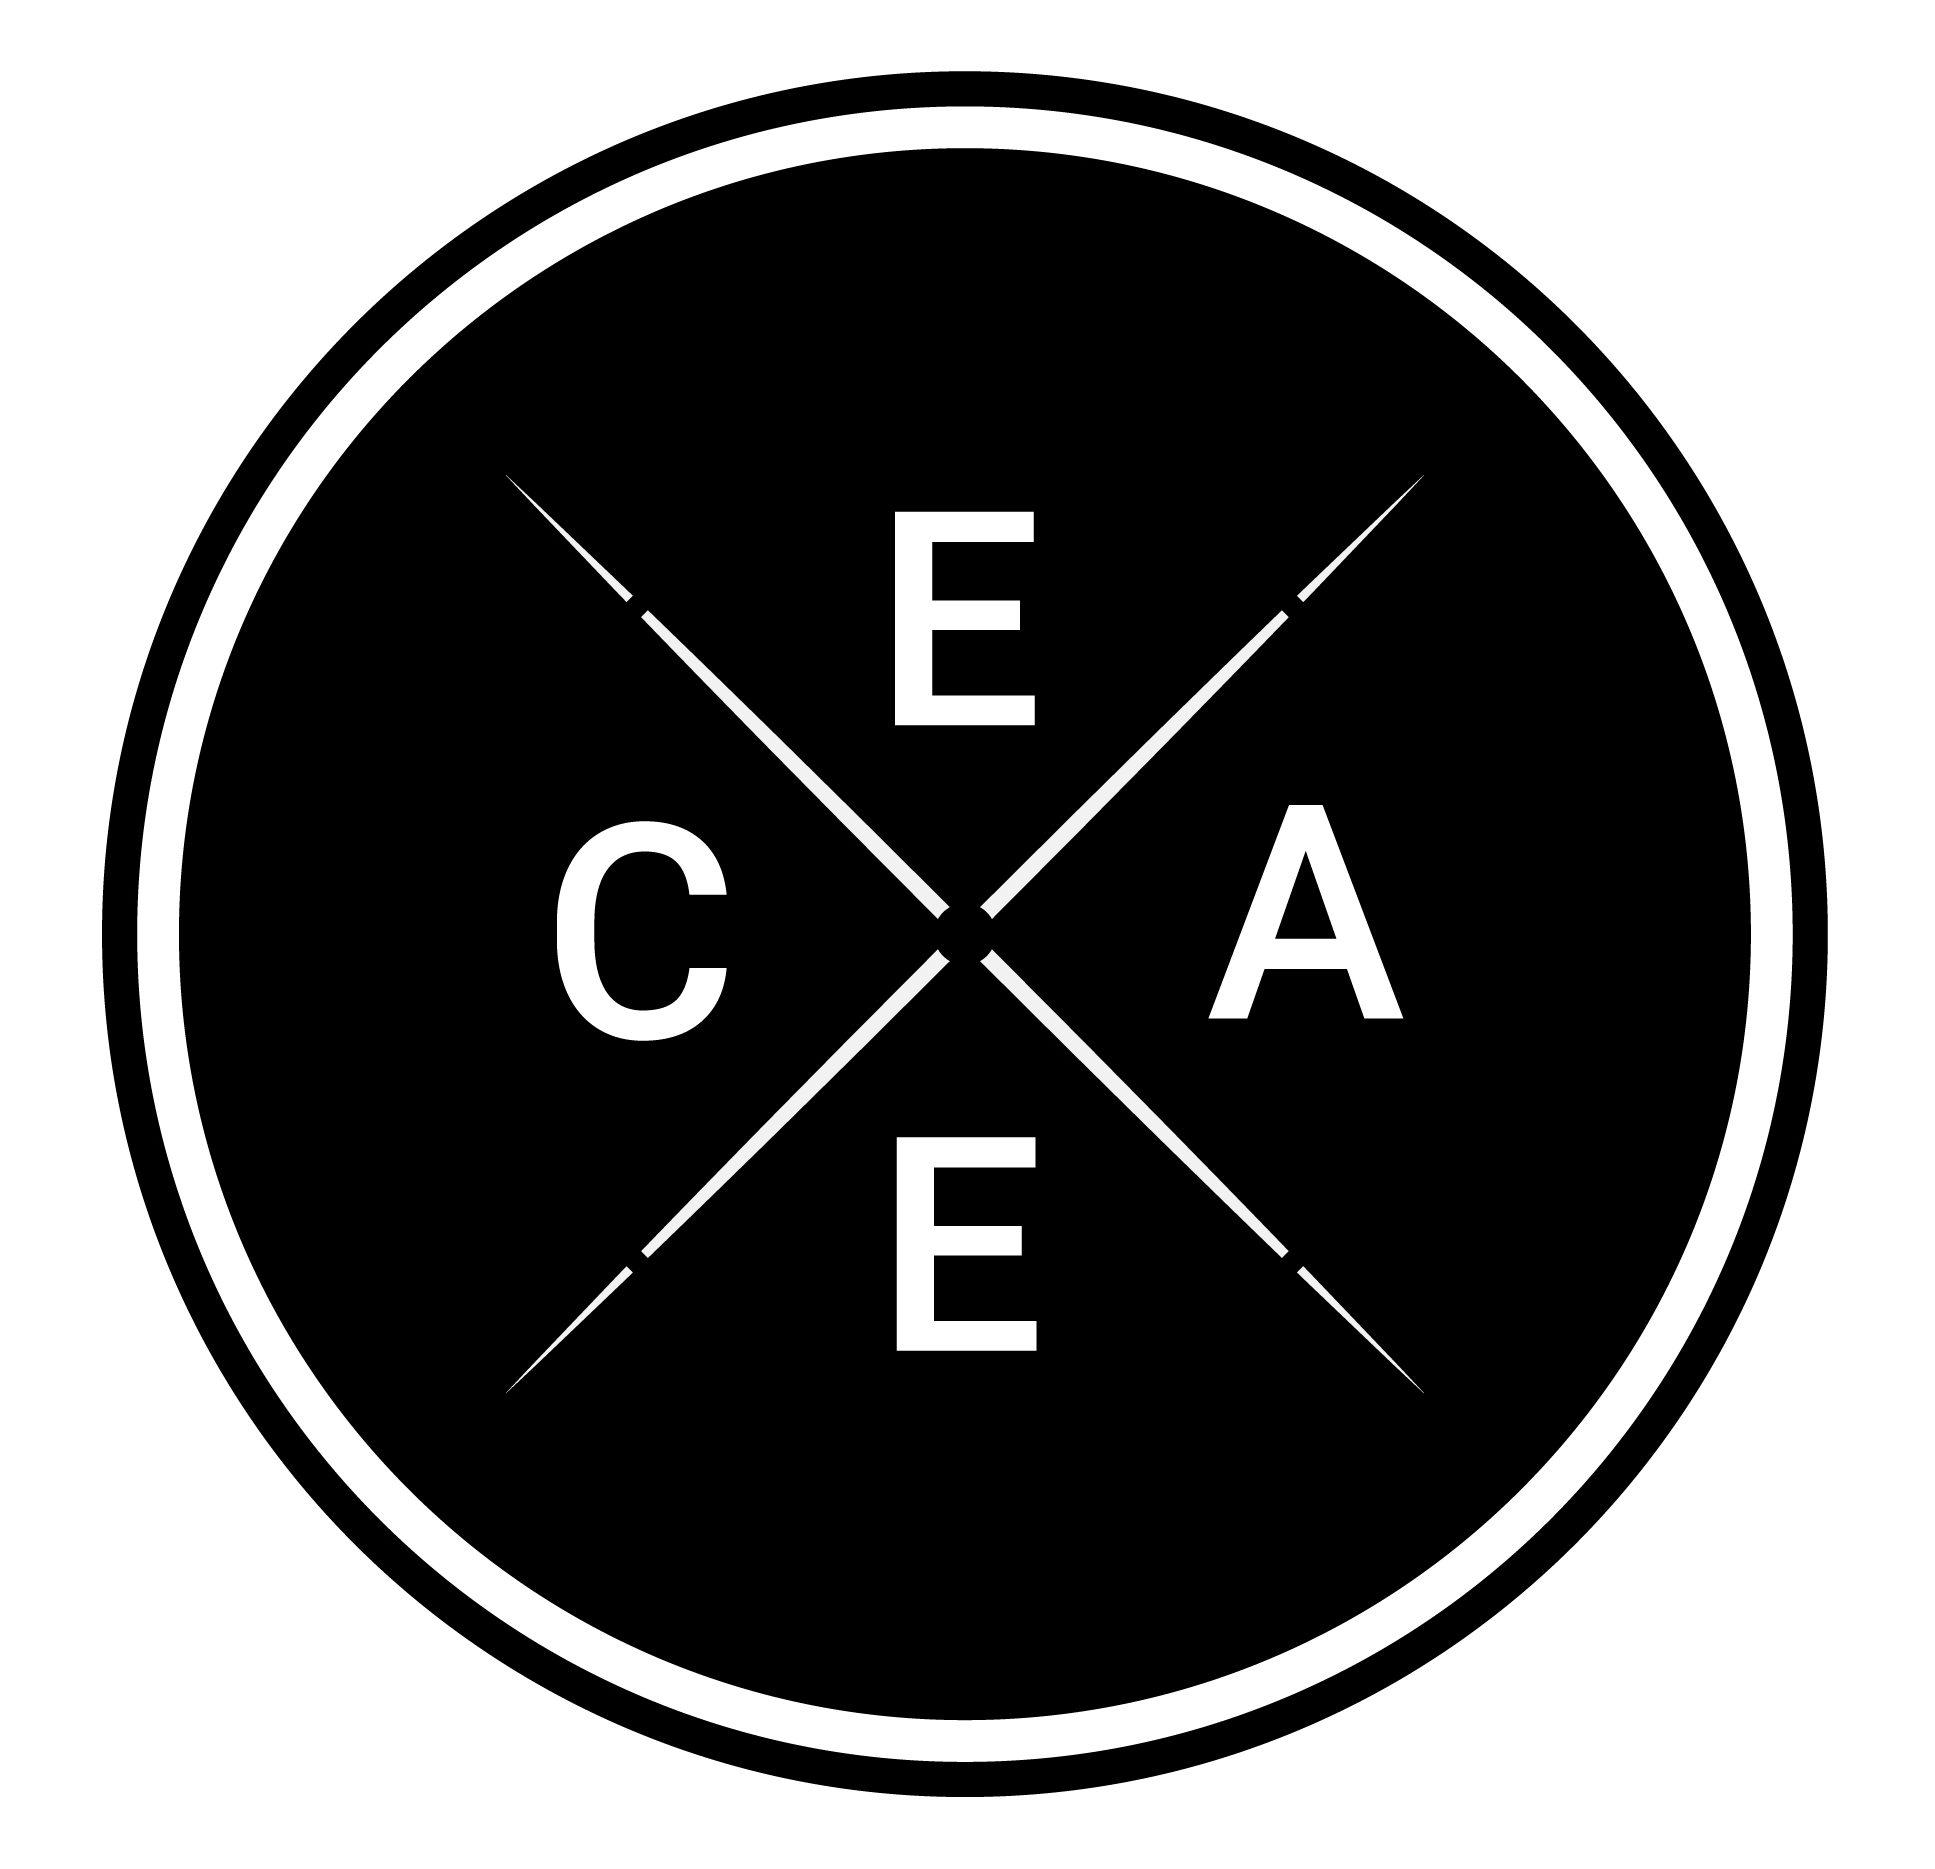 CENTRO DE EXPERIMENTACION DE ARTES ESCENICAS